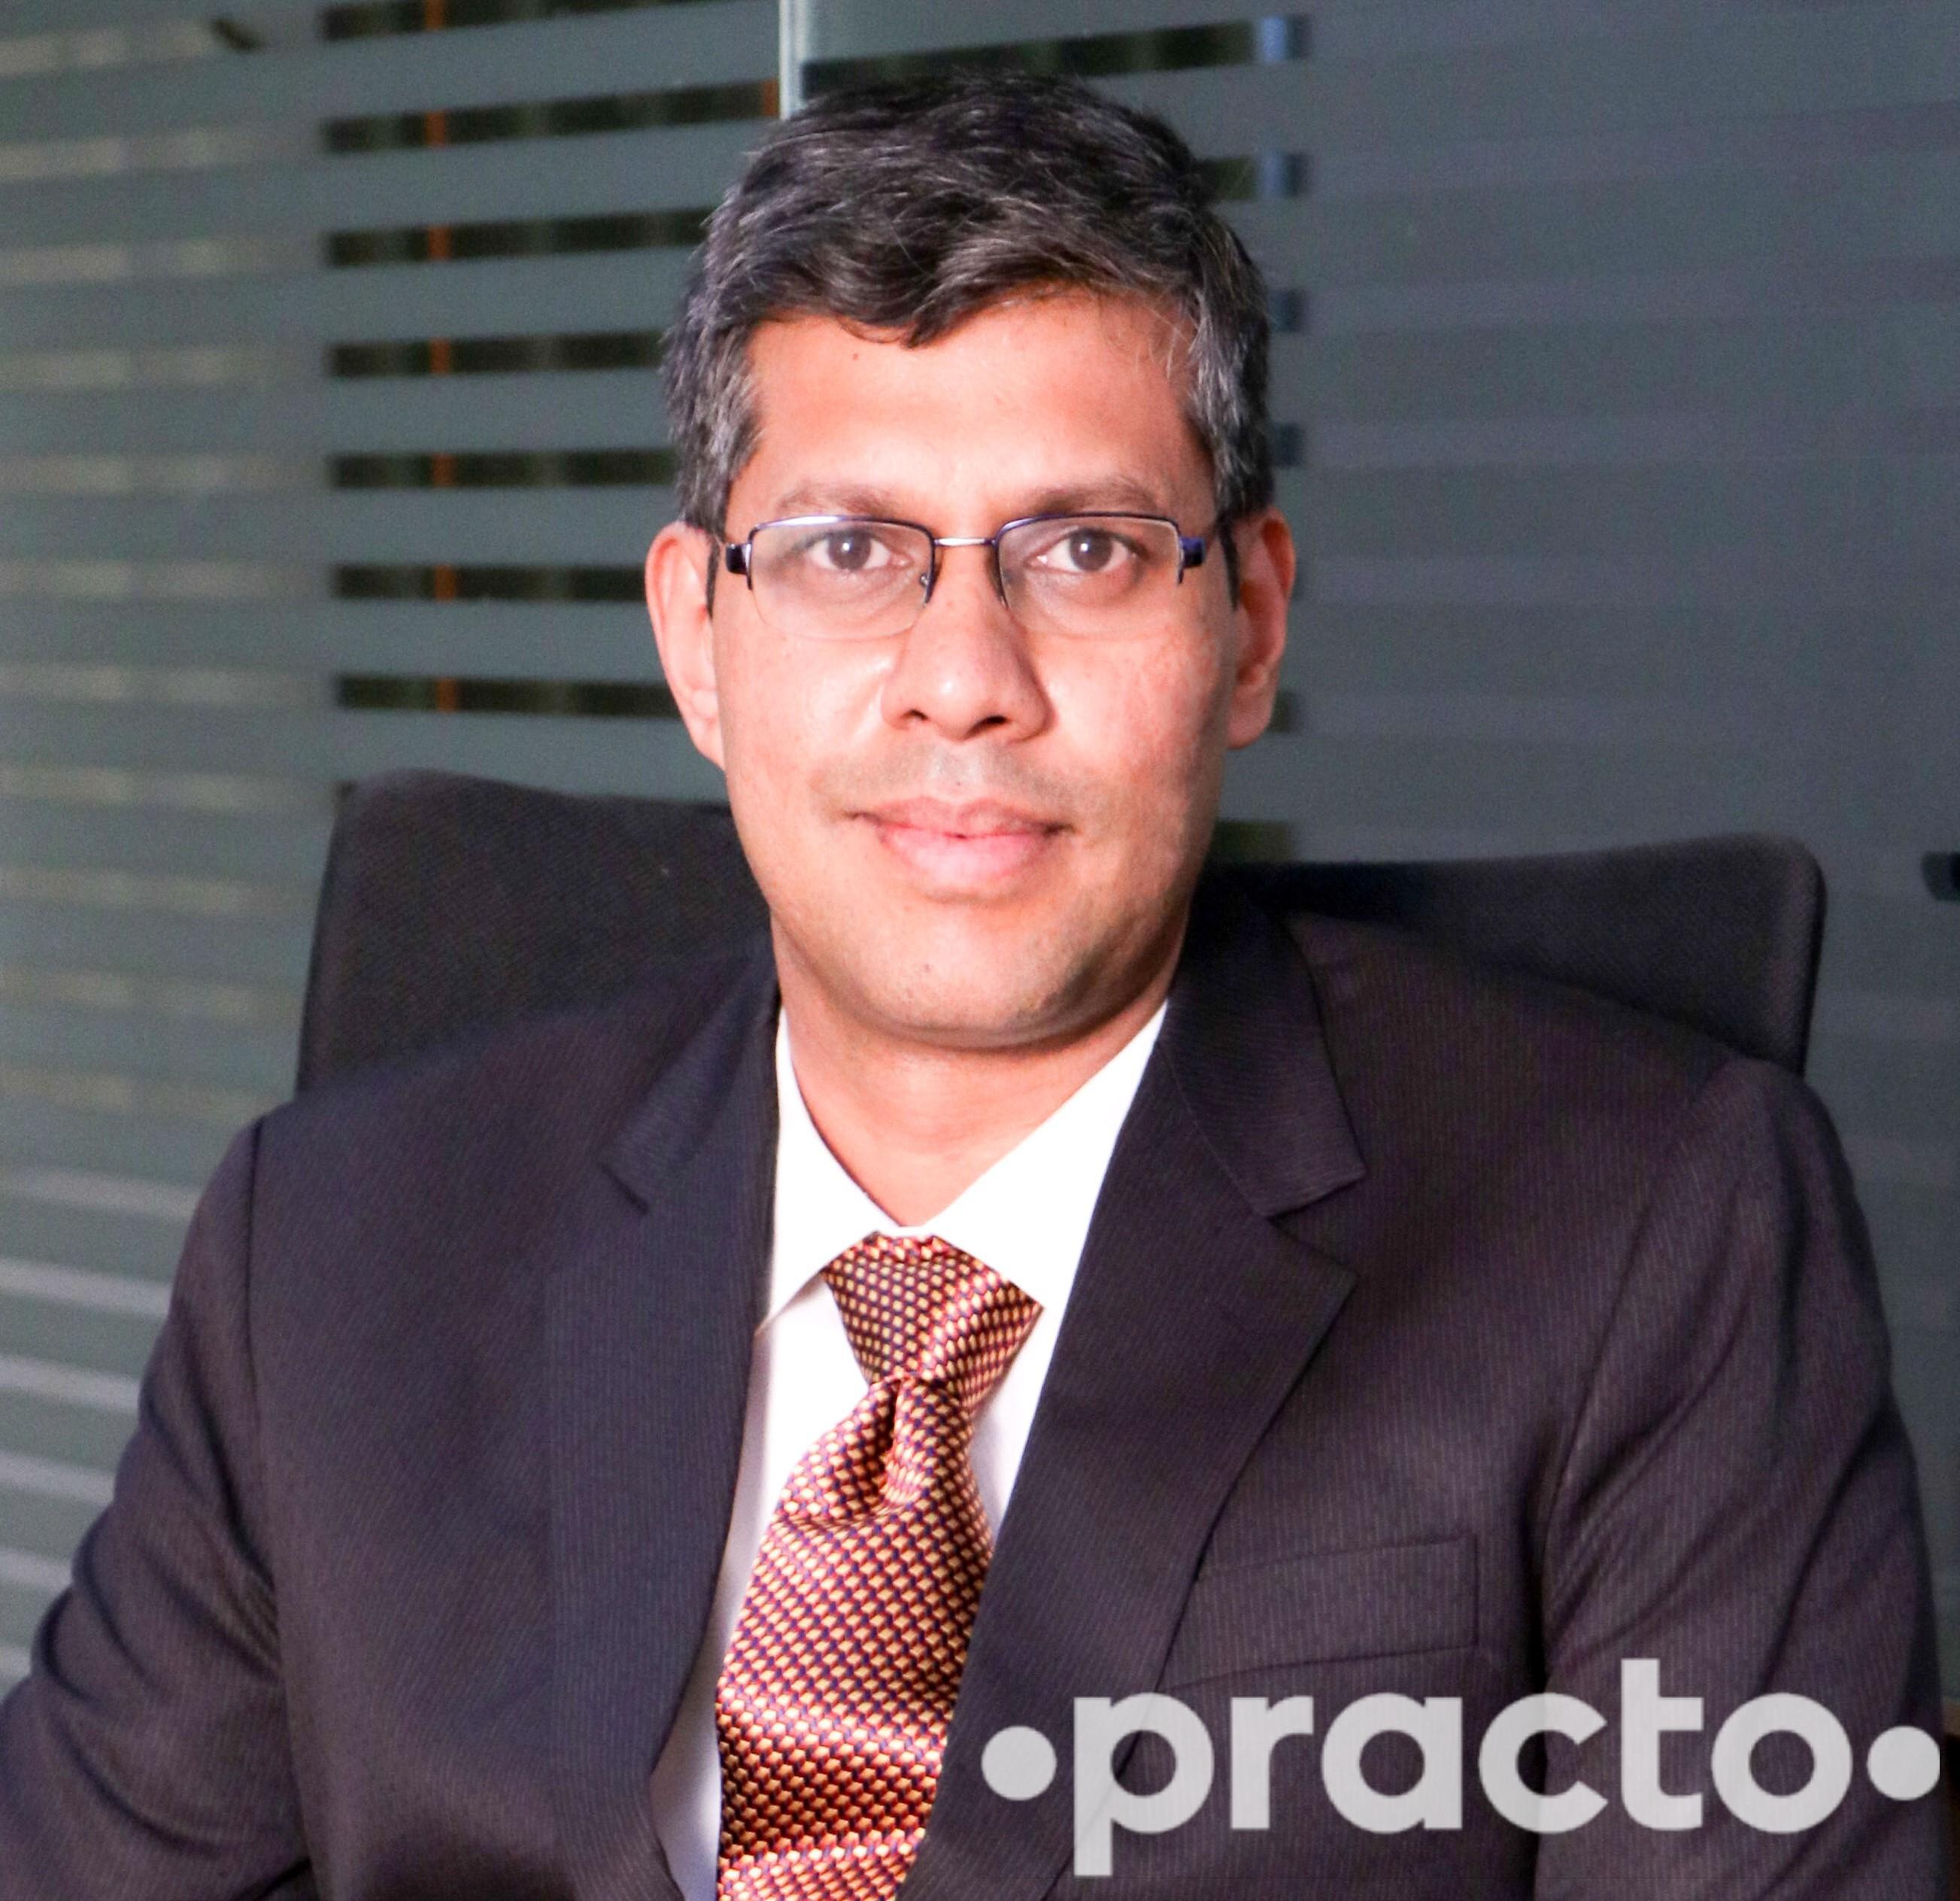 Dr. Syed Imran